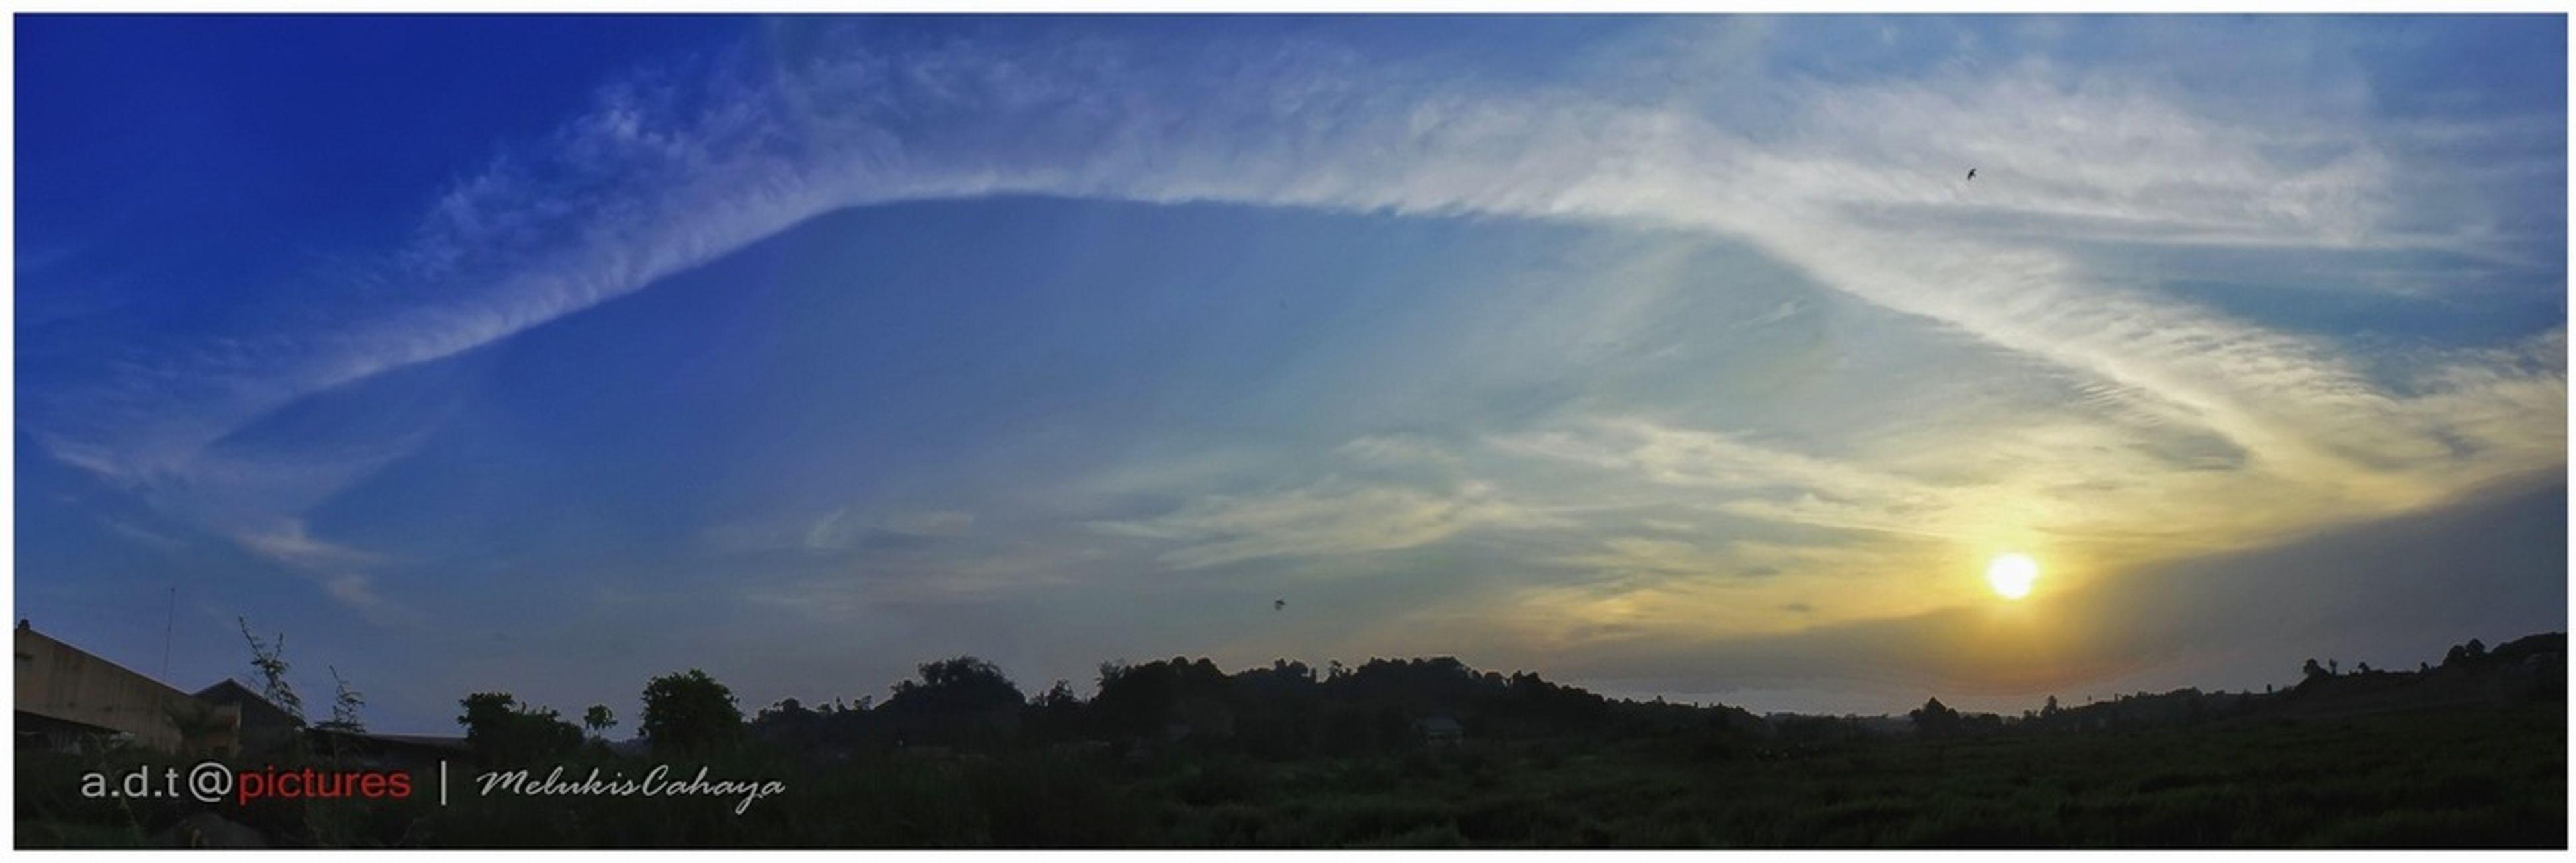 sunset, sky, scenics, beauty in nature, transfer print, silhouette, tranquil scene, sun, cloud - sky, landscape, tranquility, auto post production filter, nature, orange color, idyllic, sunlight, mountain, cloud, outdoors, transportation